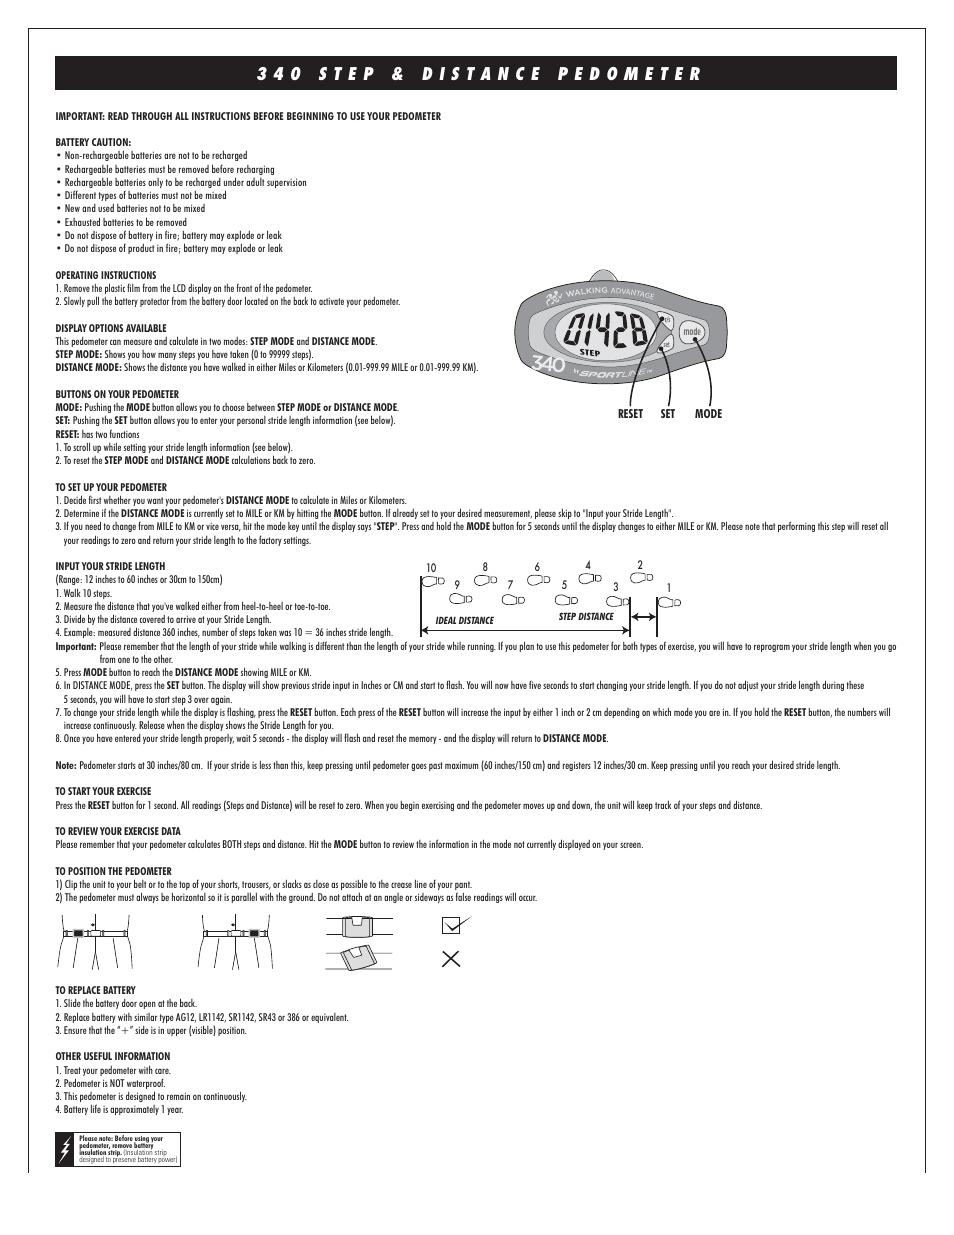 Sportline 340 Step User Manual